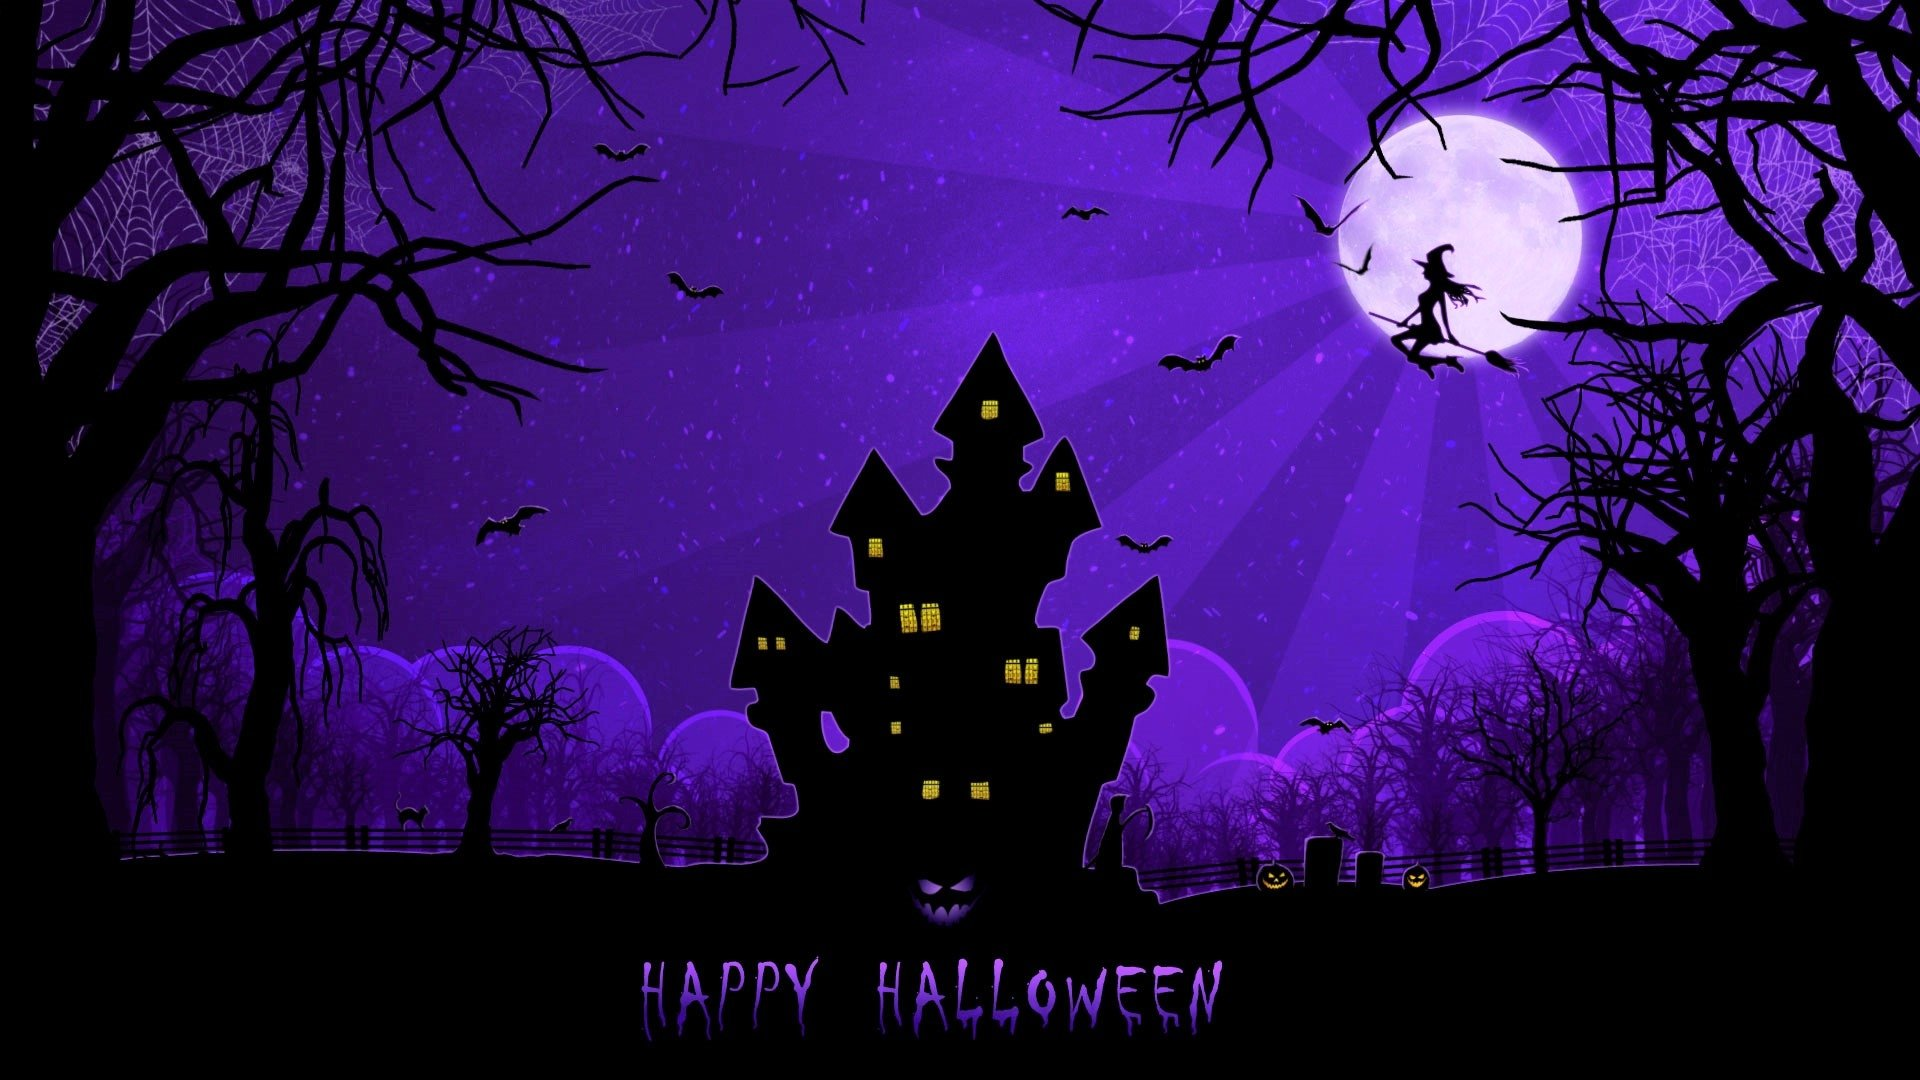 hd hintergrundbilder mond spinngewebe haus halloween hexe nacht 1920x1080